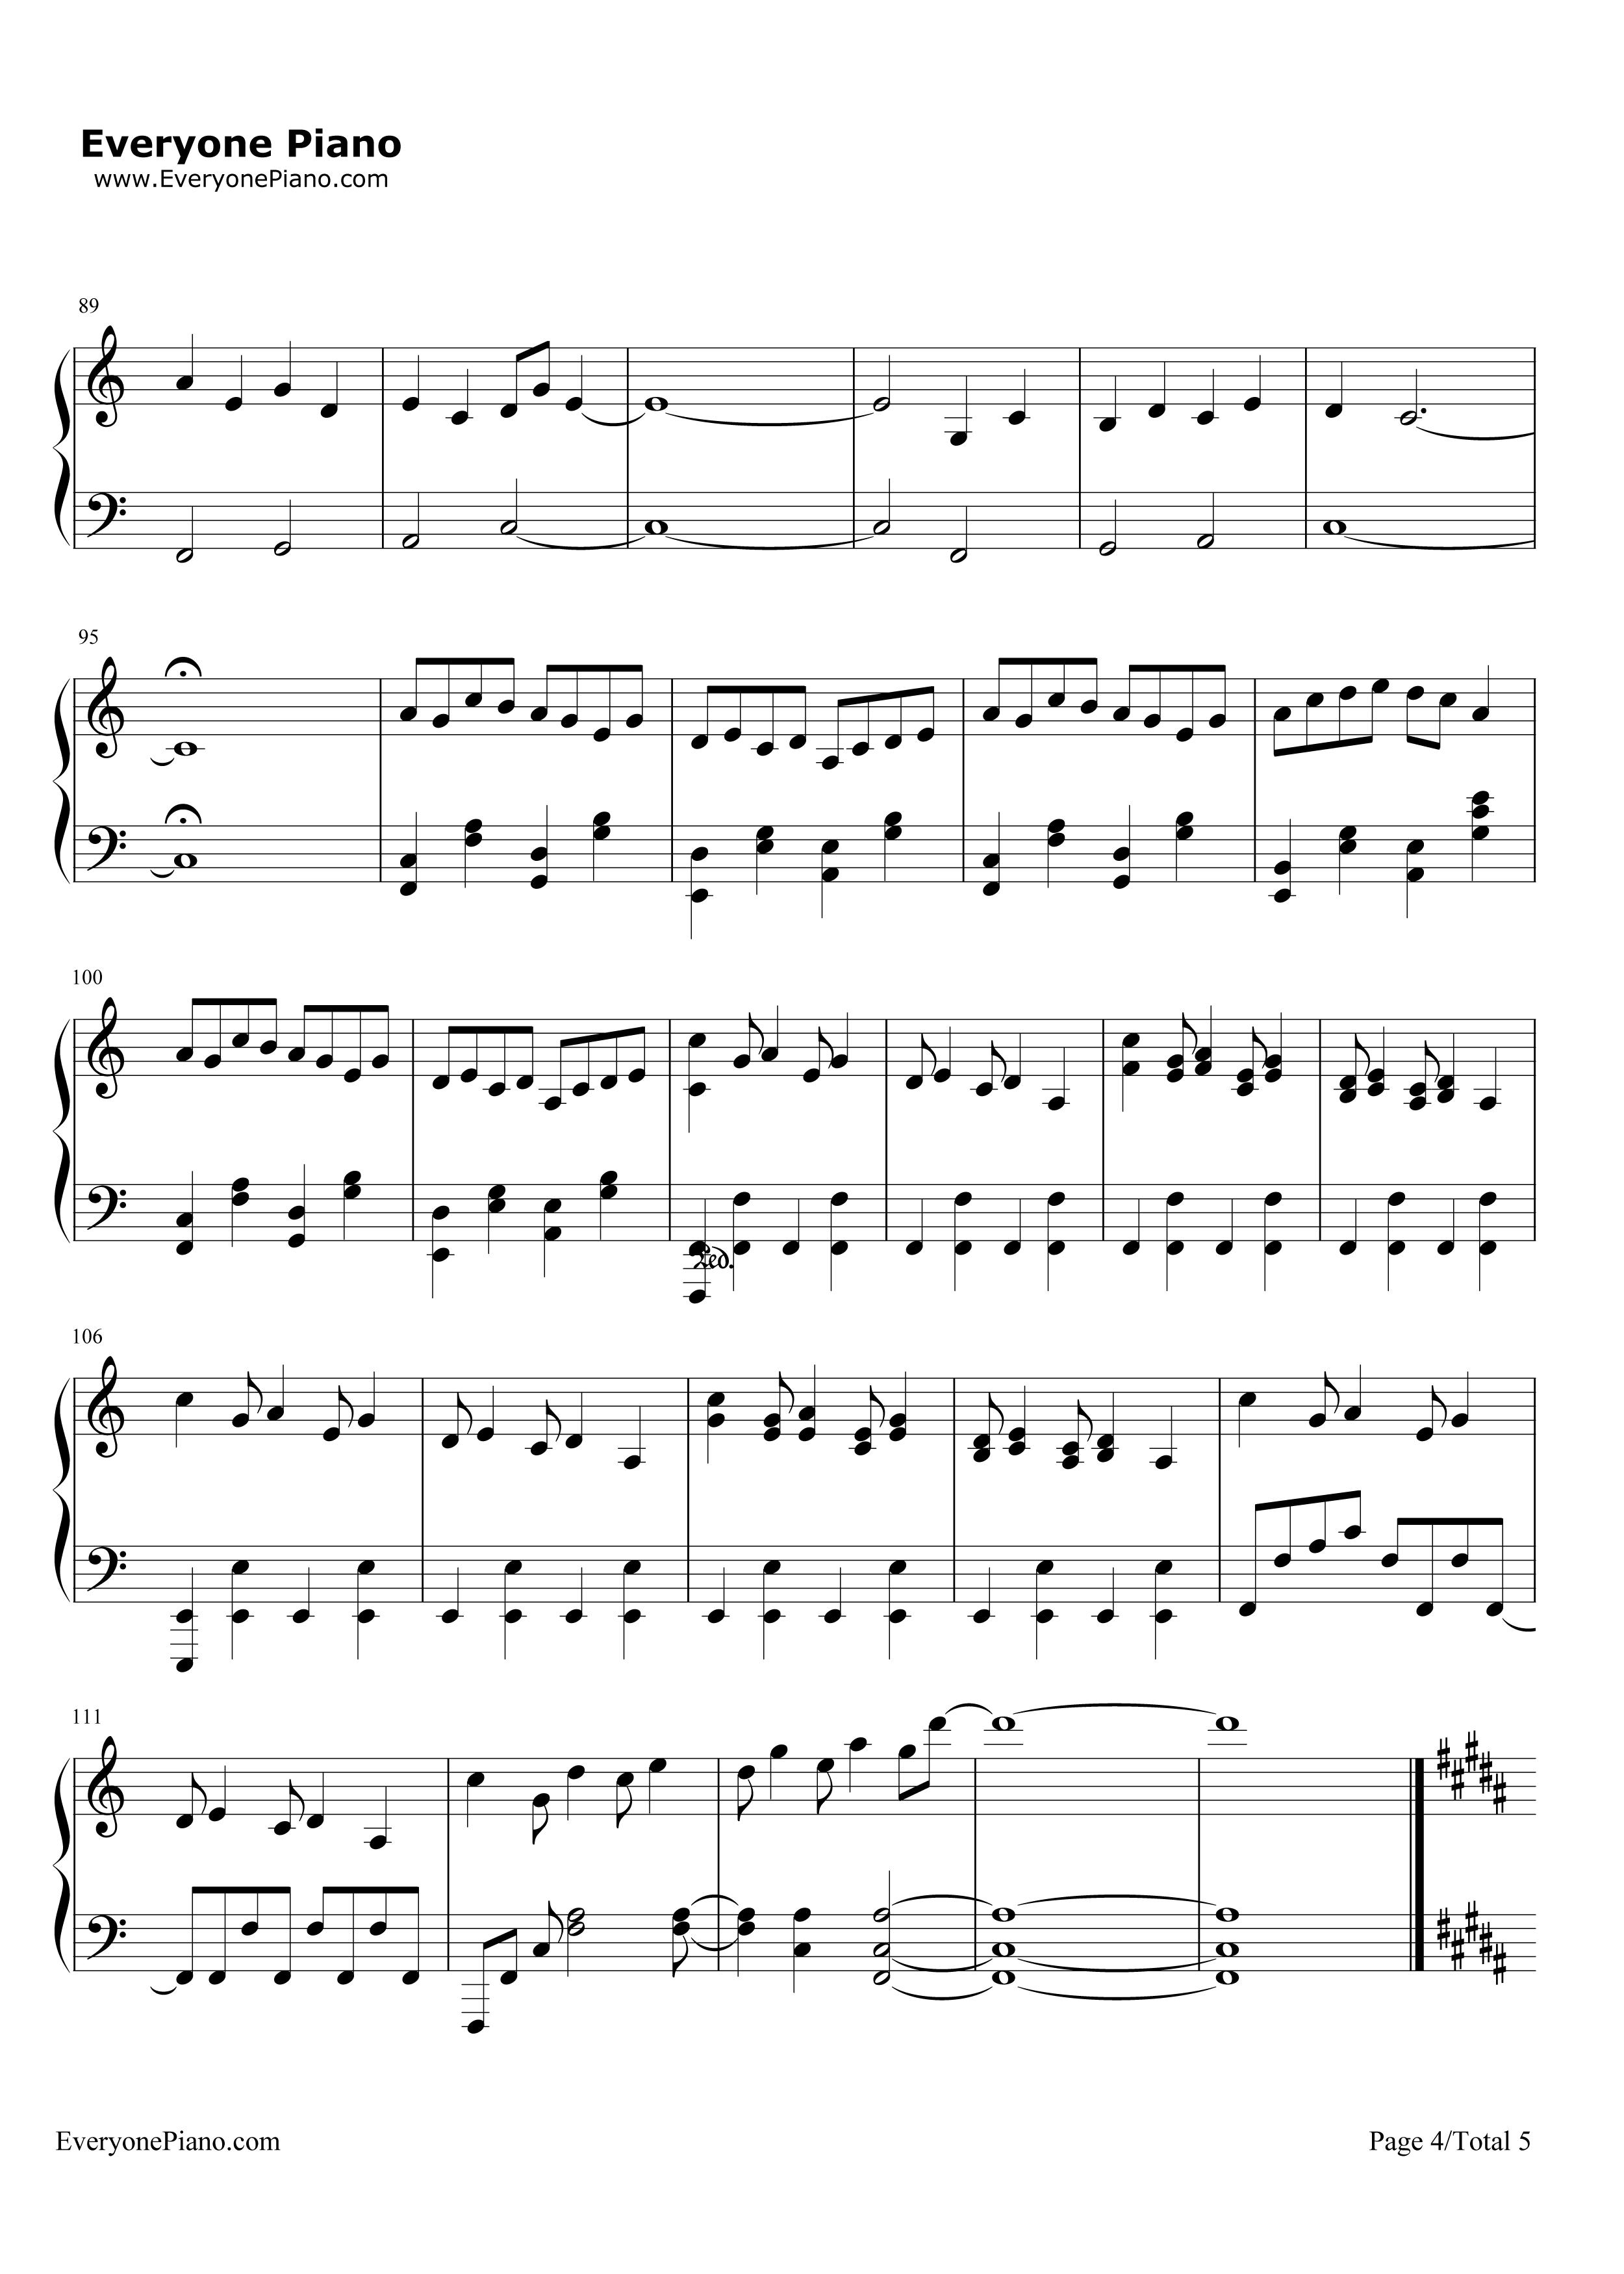 楽譜ネット|楽譜・楽器販売サイト - 卒園・卒業ソ …